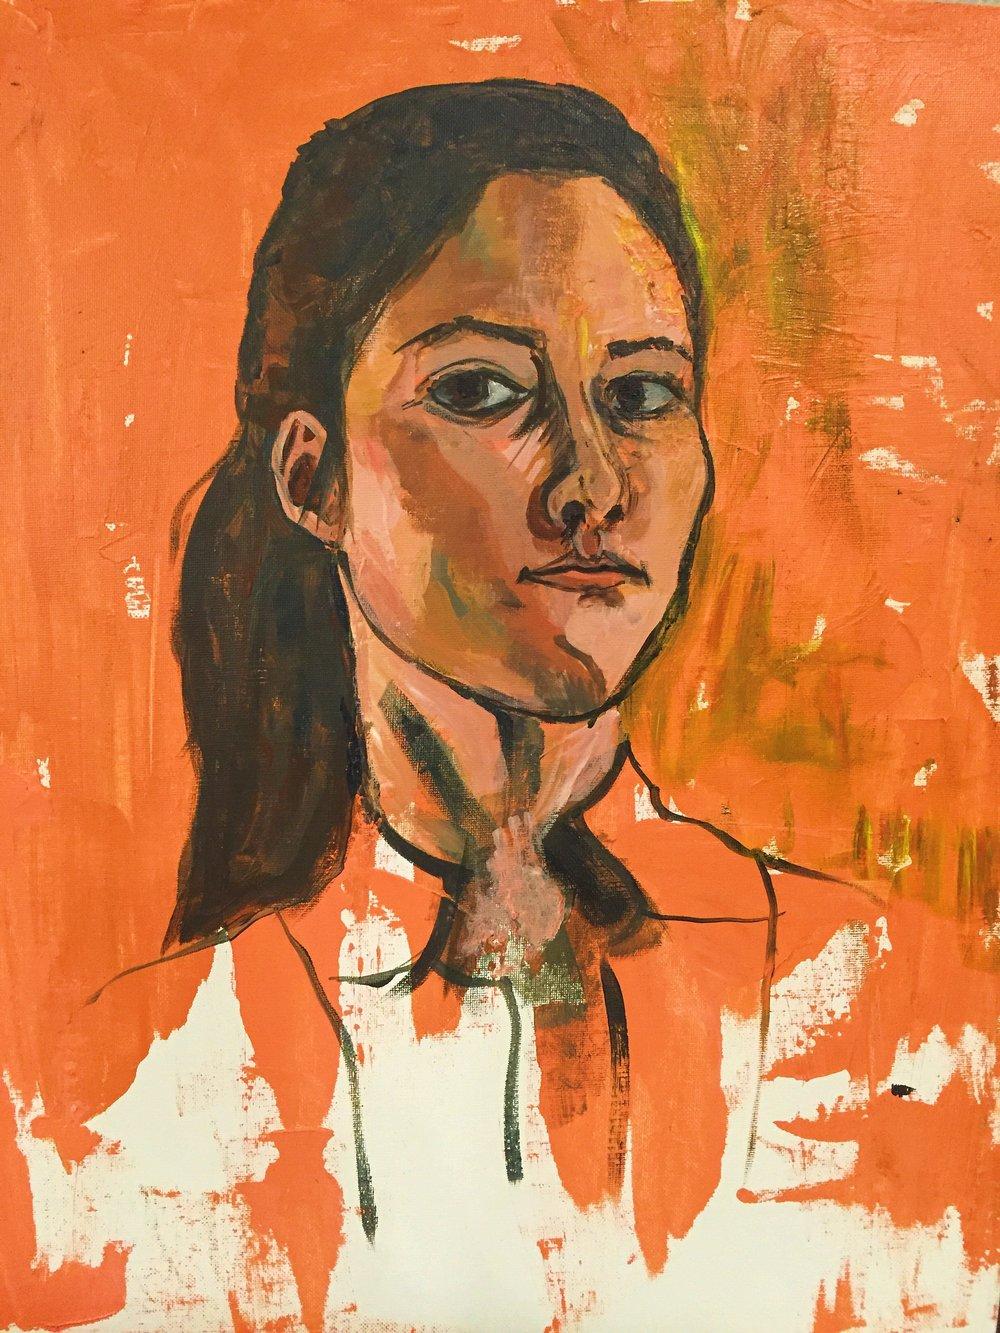 Self portrait  |  Jill Verzino